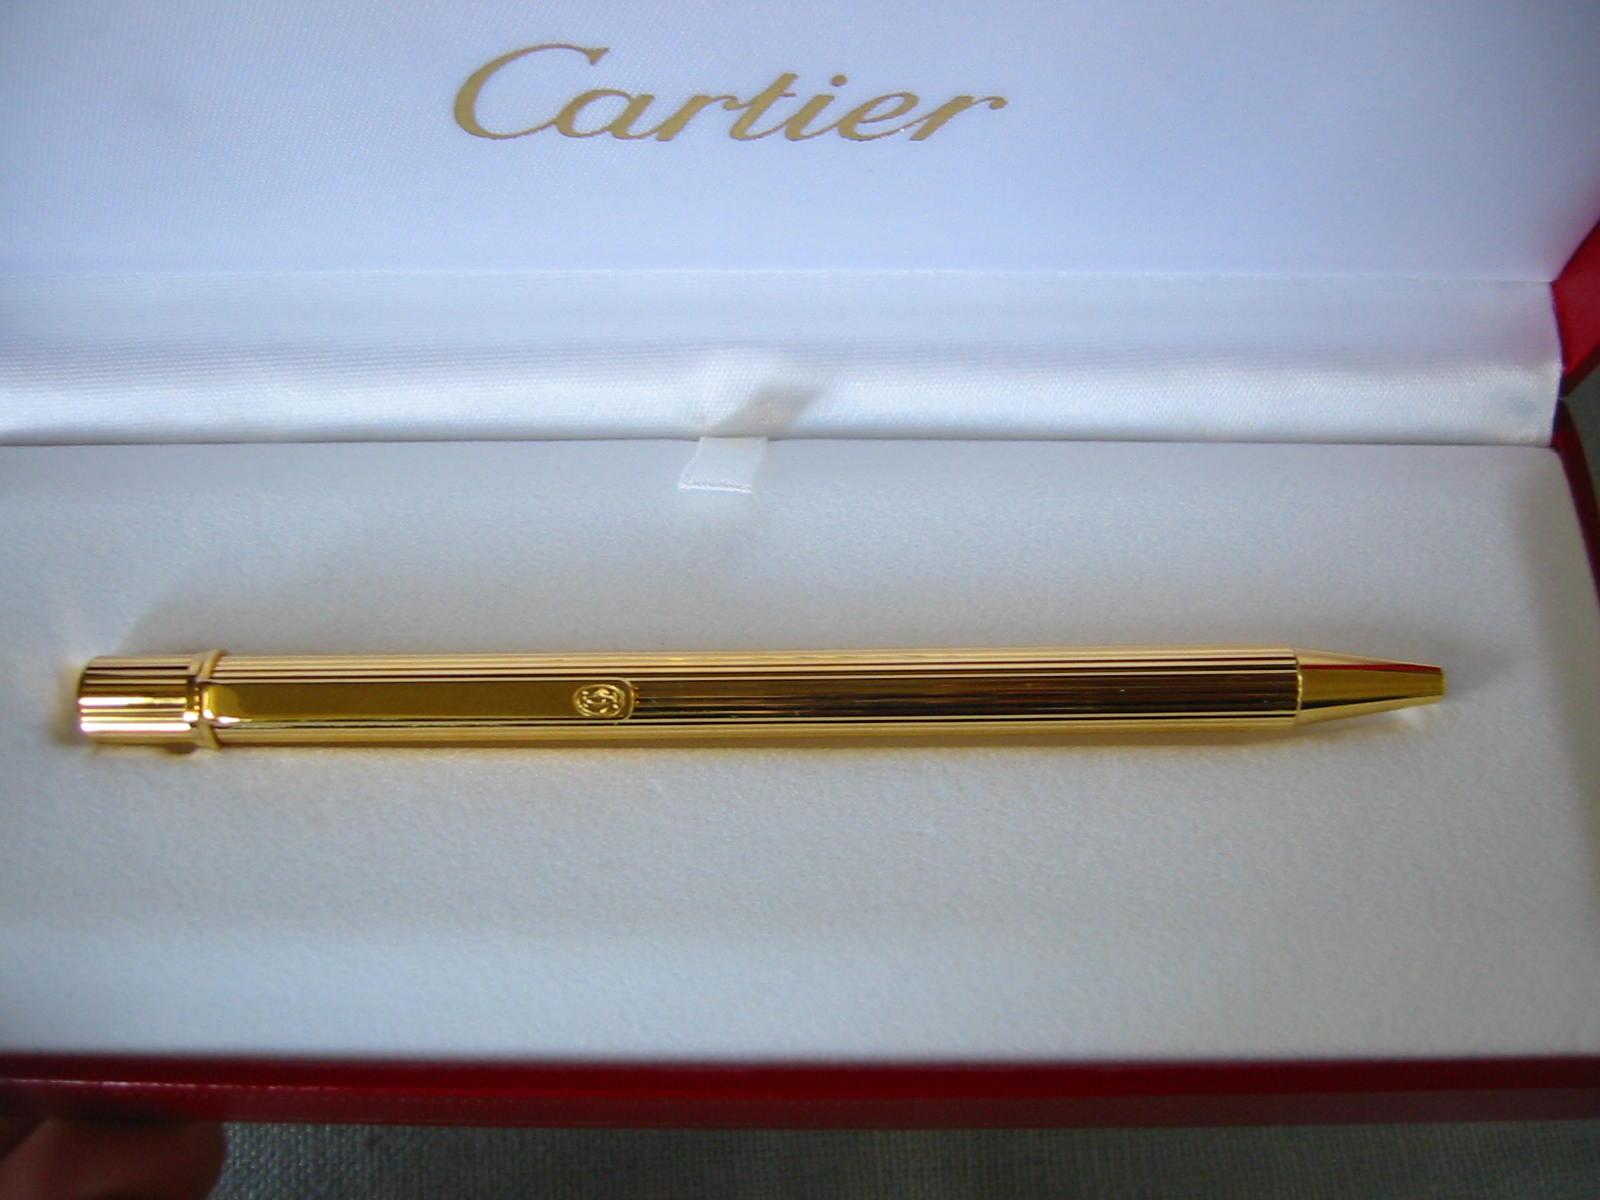 Cartier Golden Pen - For Sale